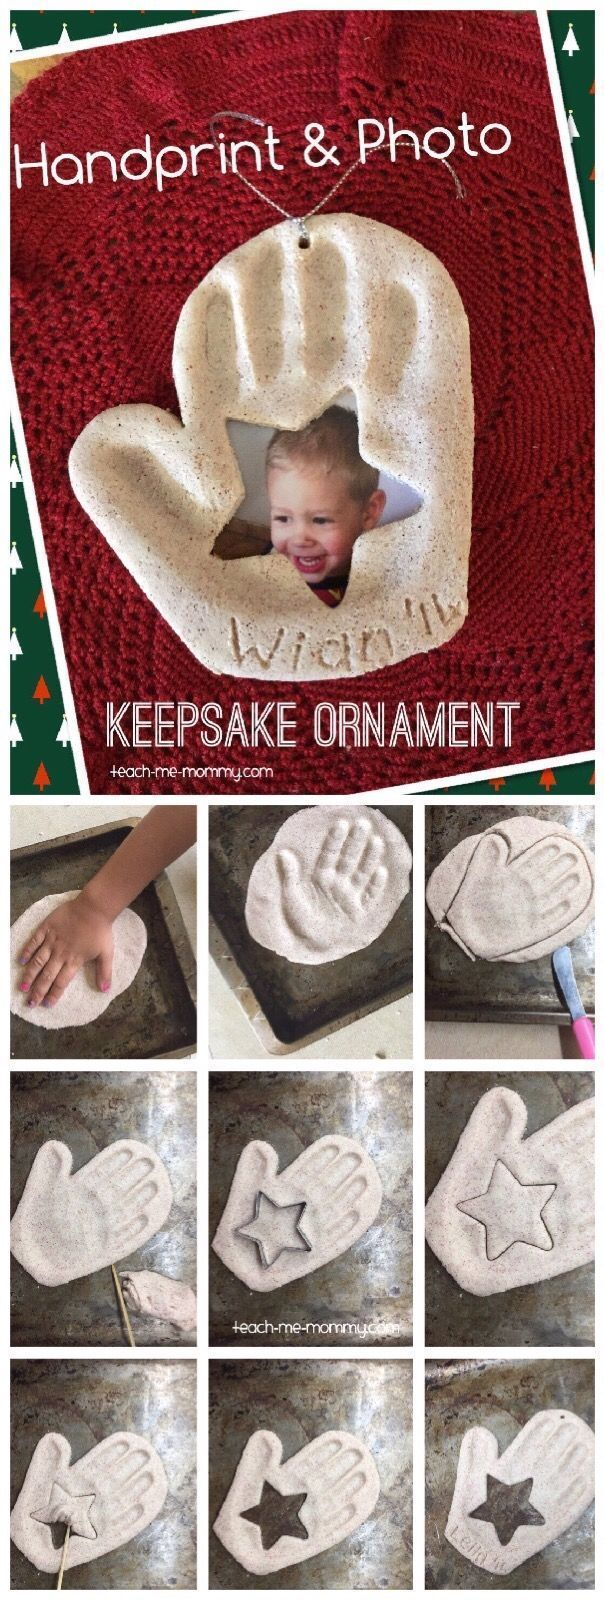 Handprint & Photo Keepsake Ornament. An adorable keepsake you make with salt dough. Great gift idea!